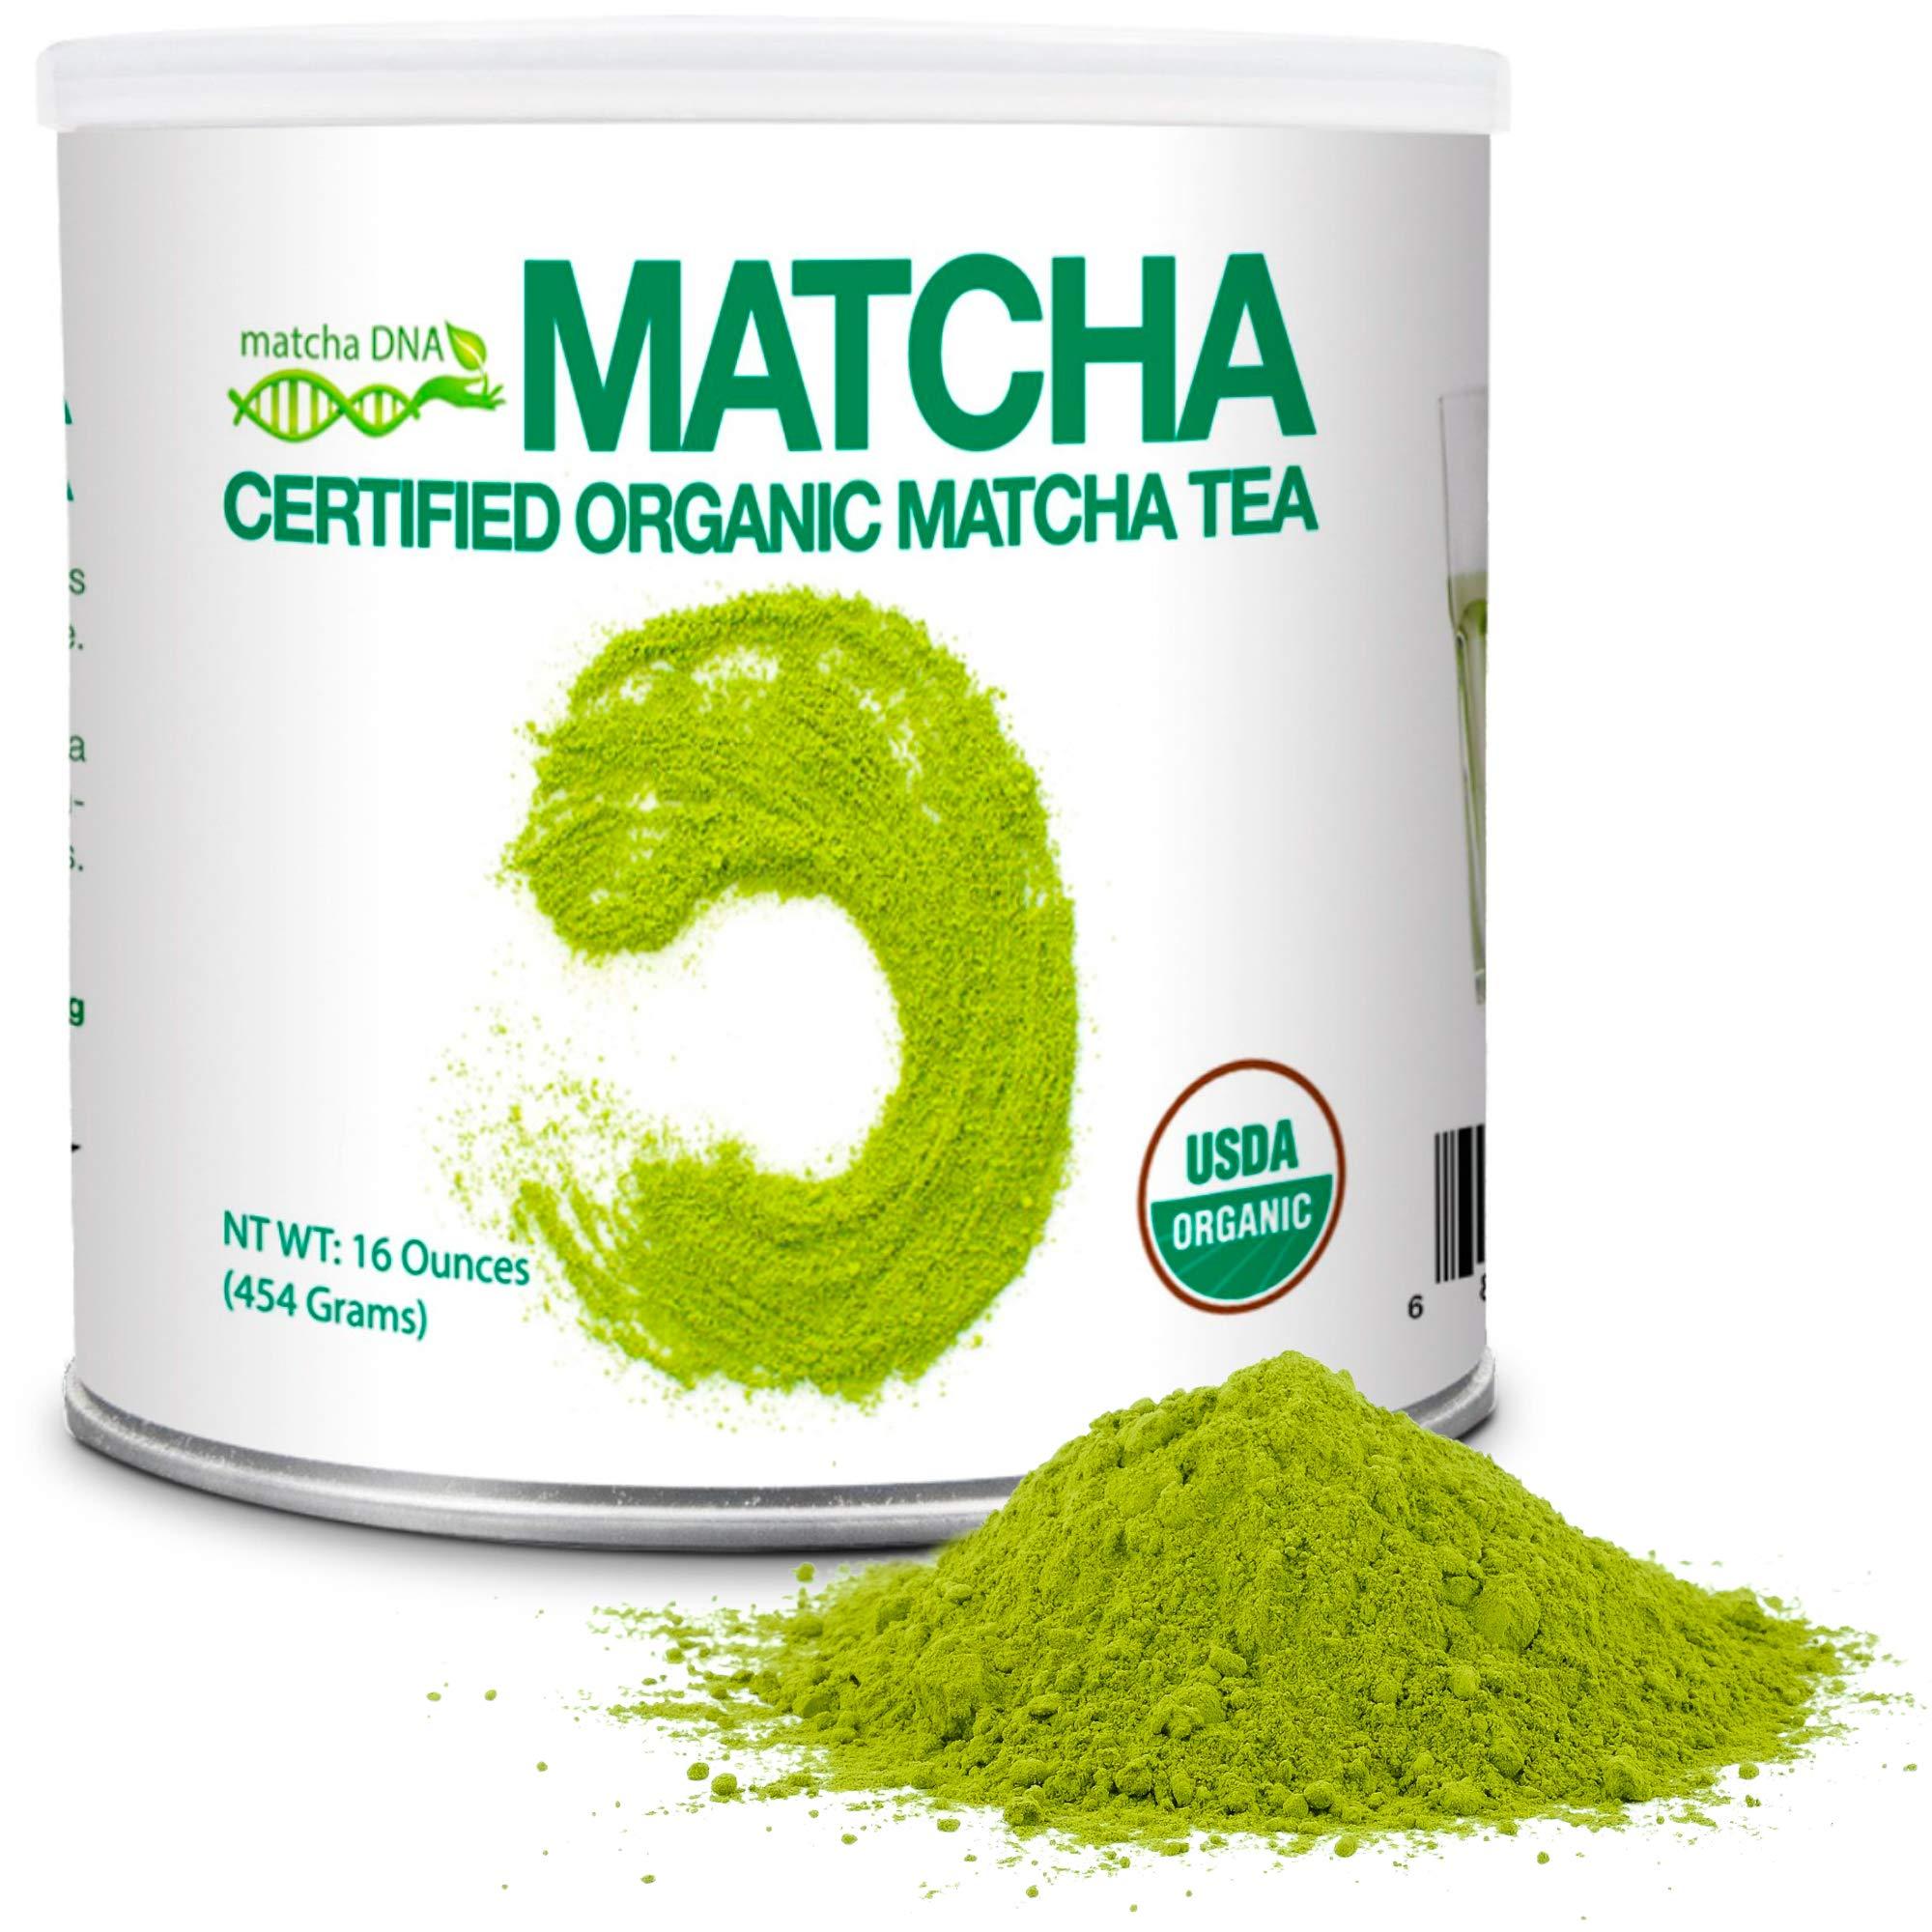 MatchaDNA 1 LB Certified Organic Matcha Green Tea Powder (16 OZ TIN CAN) by MATCHA DNA